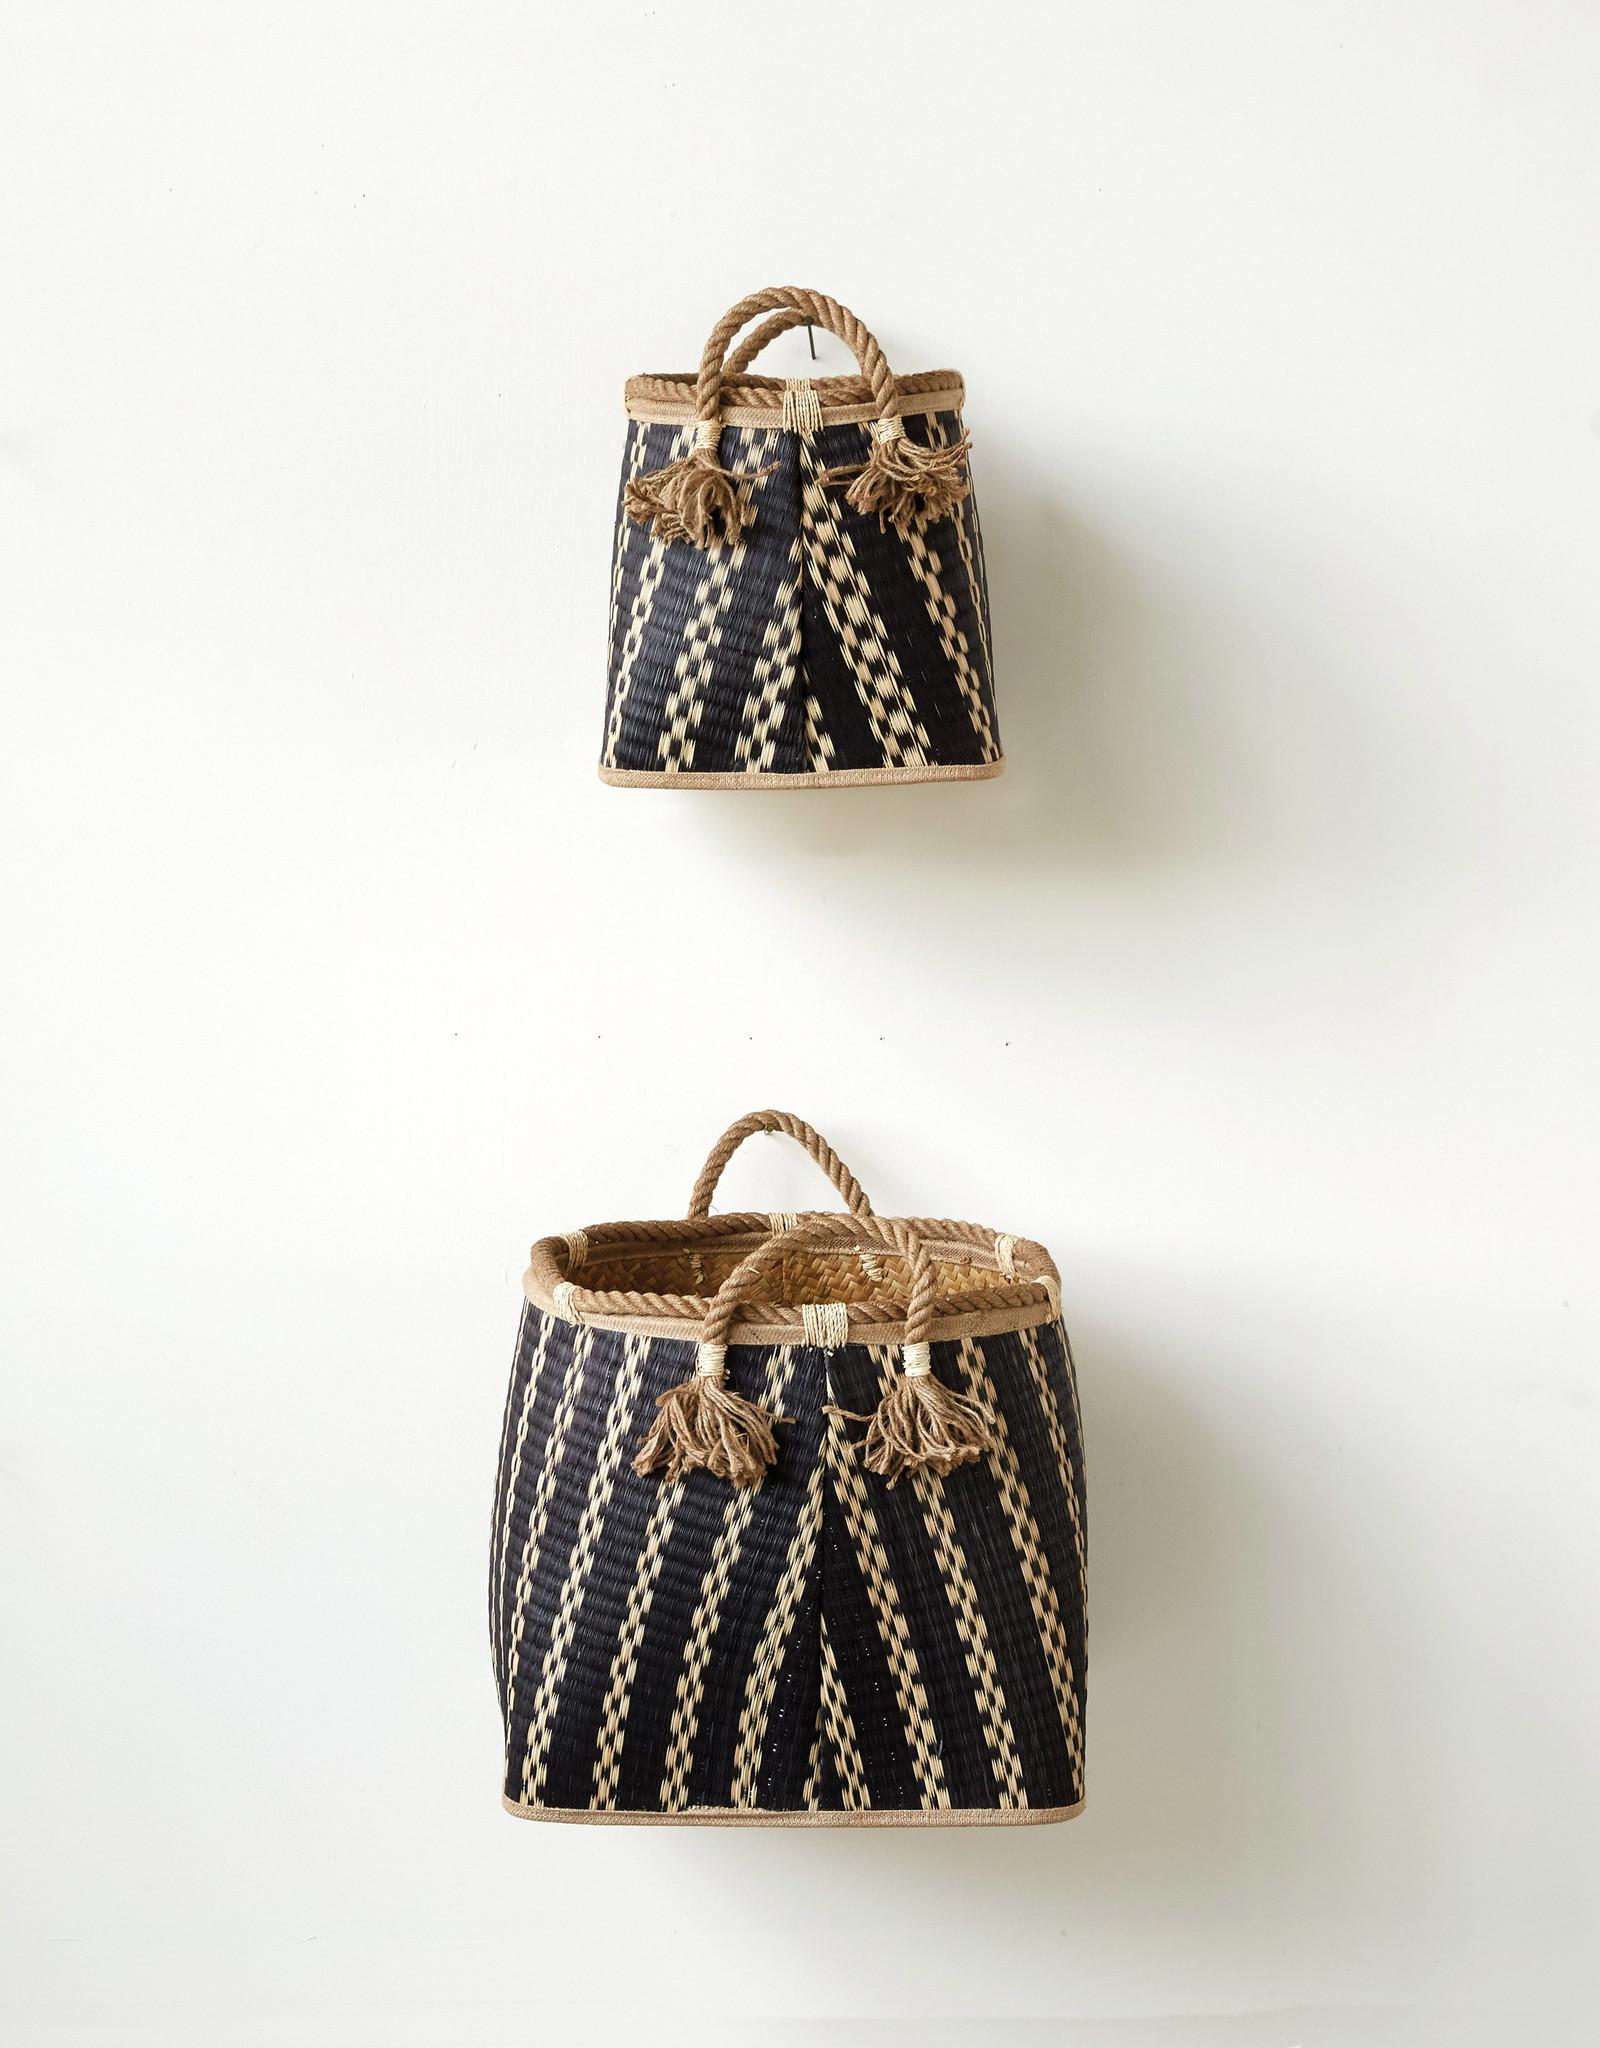 Website Wicker Baskets with Rope Handles